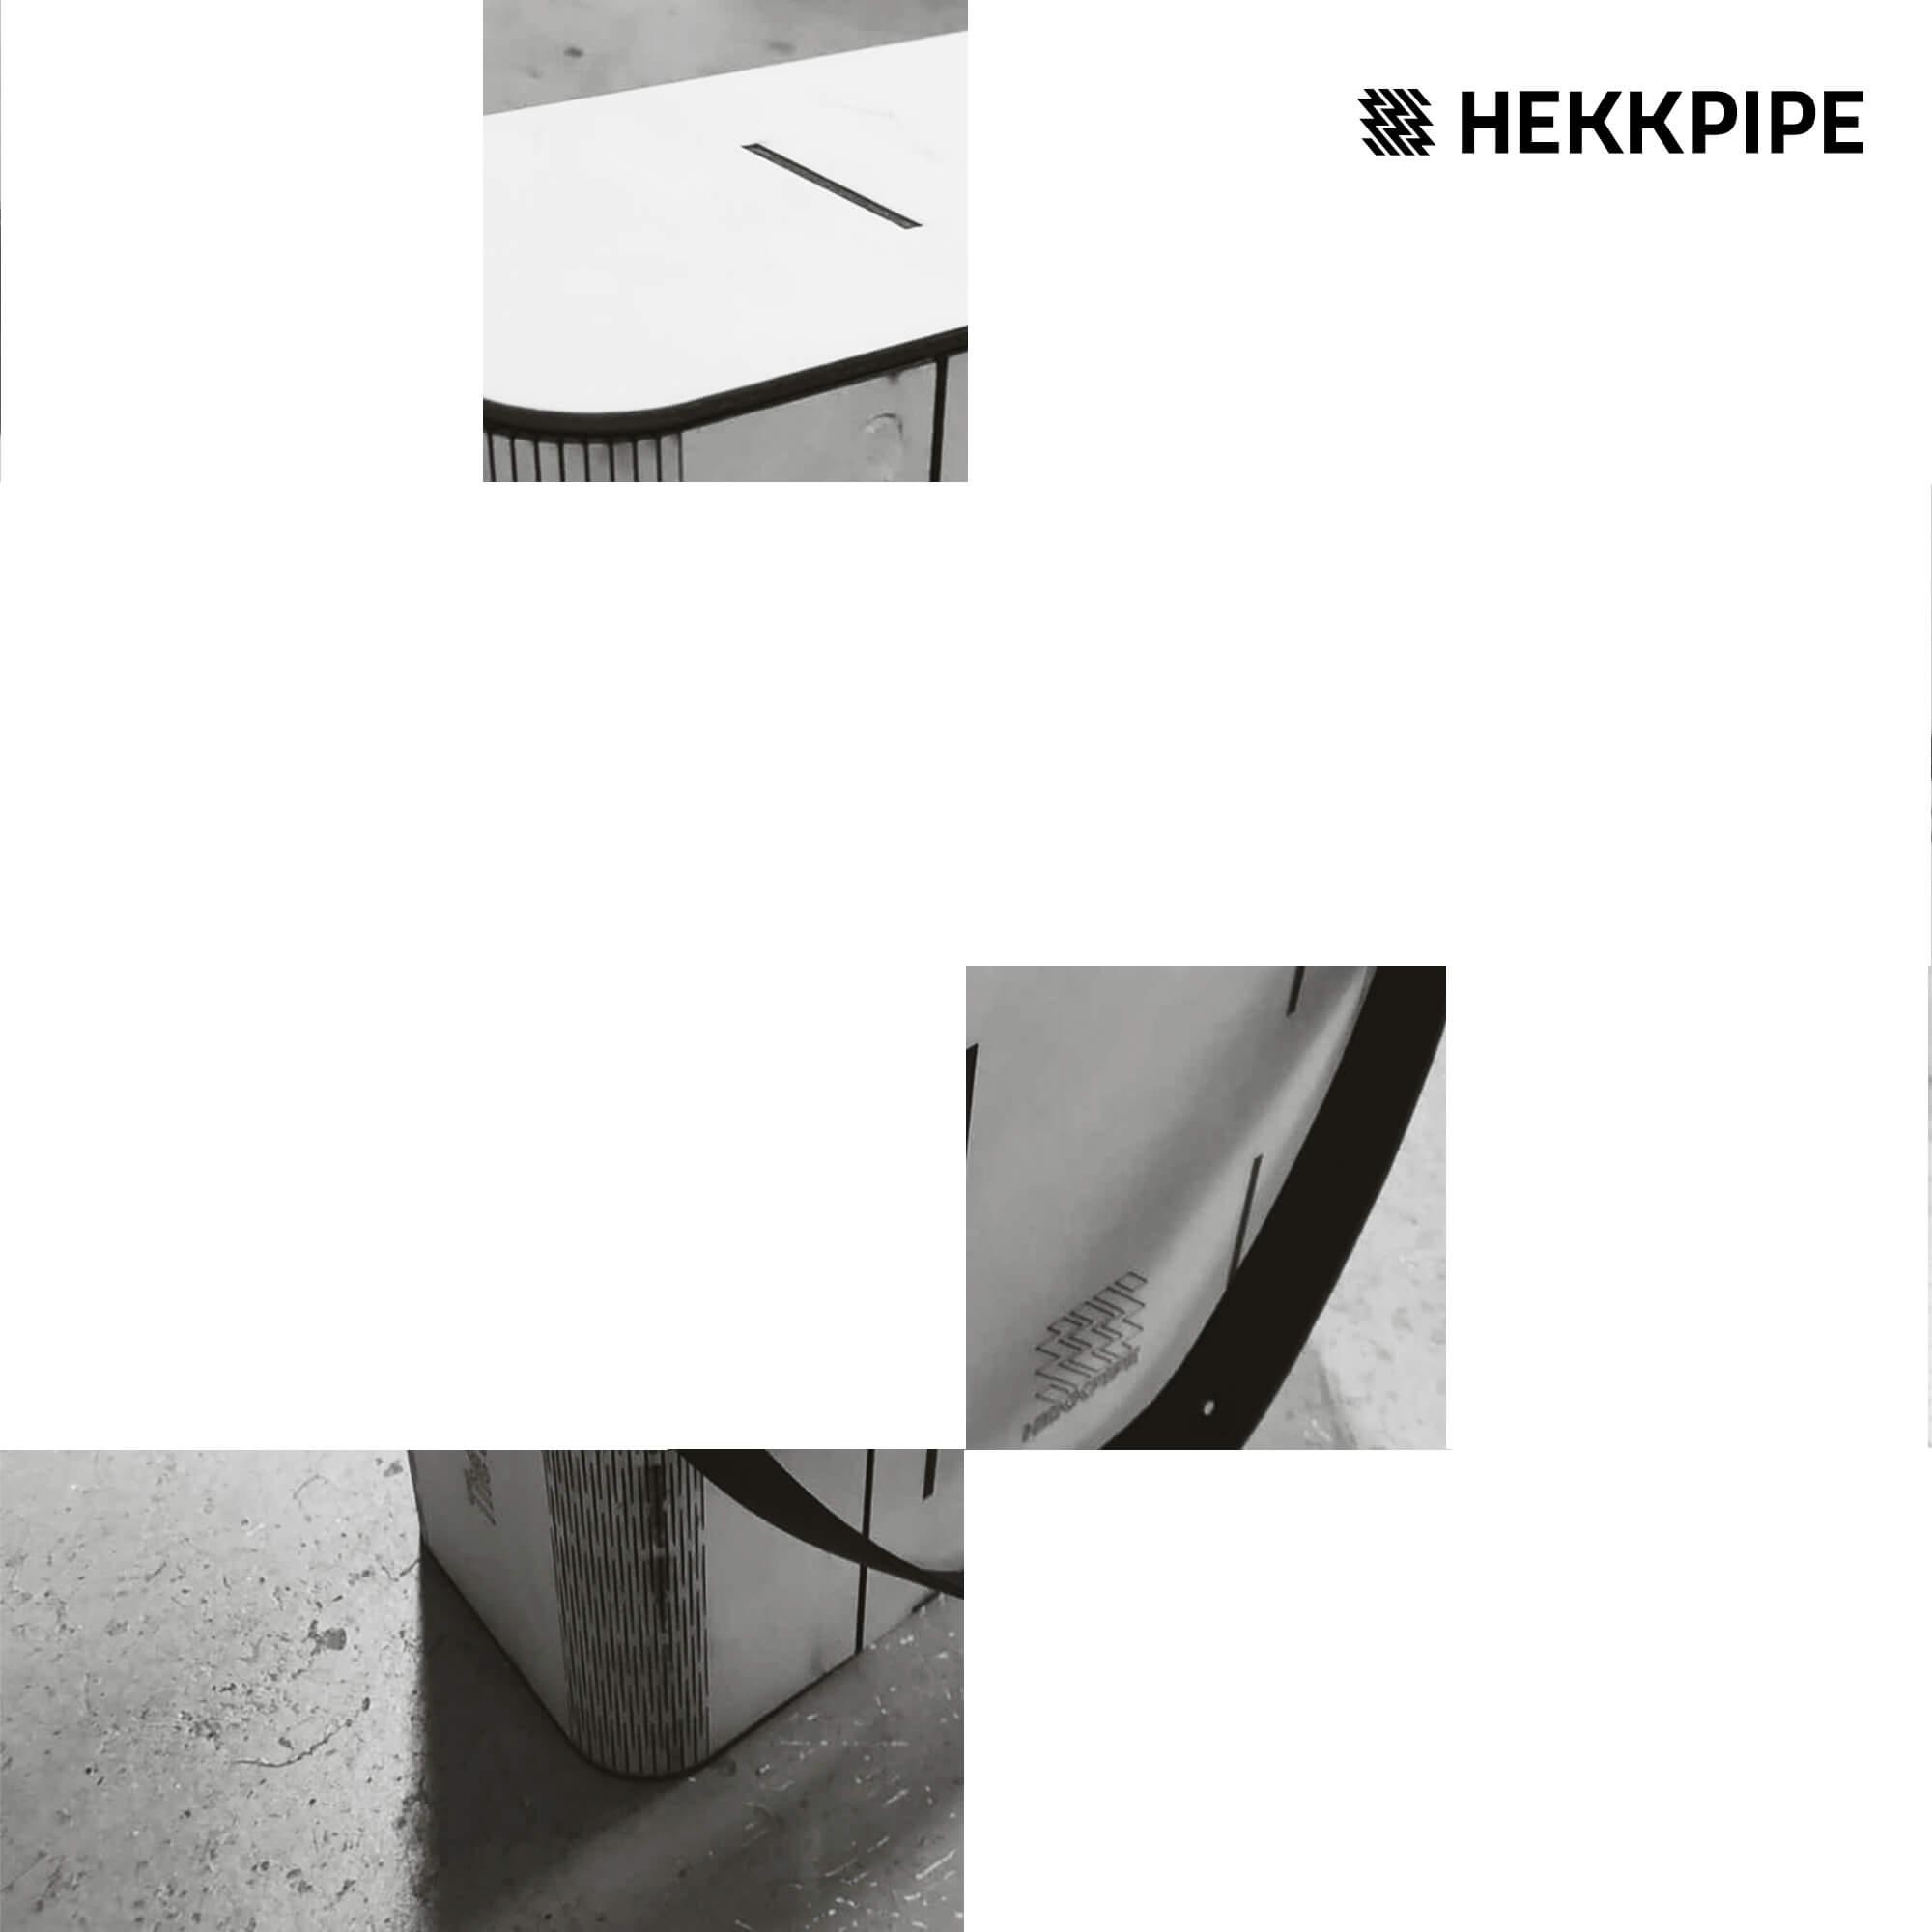 hekkpipe case mosaic